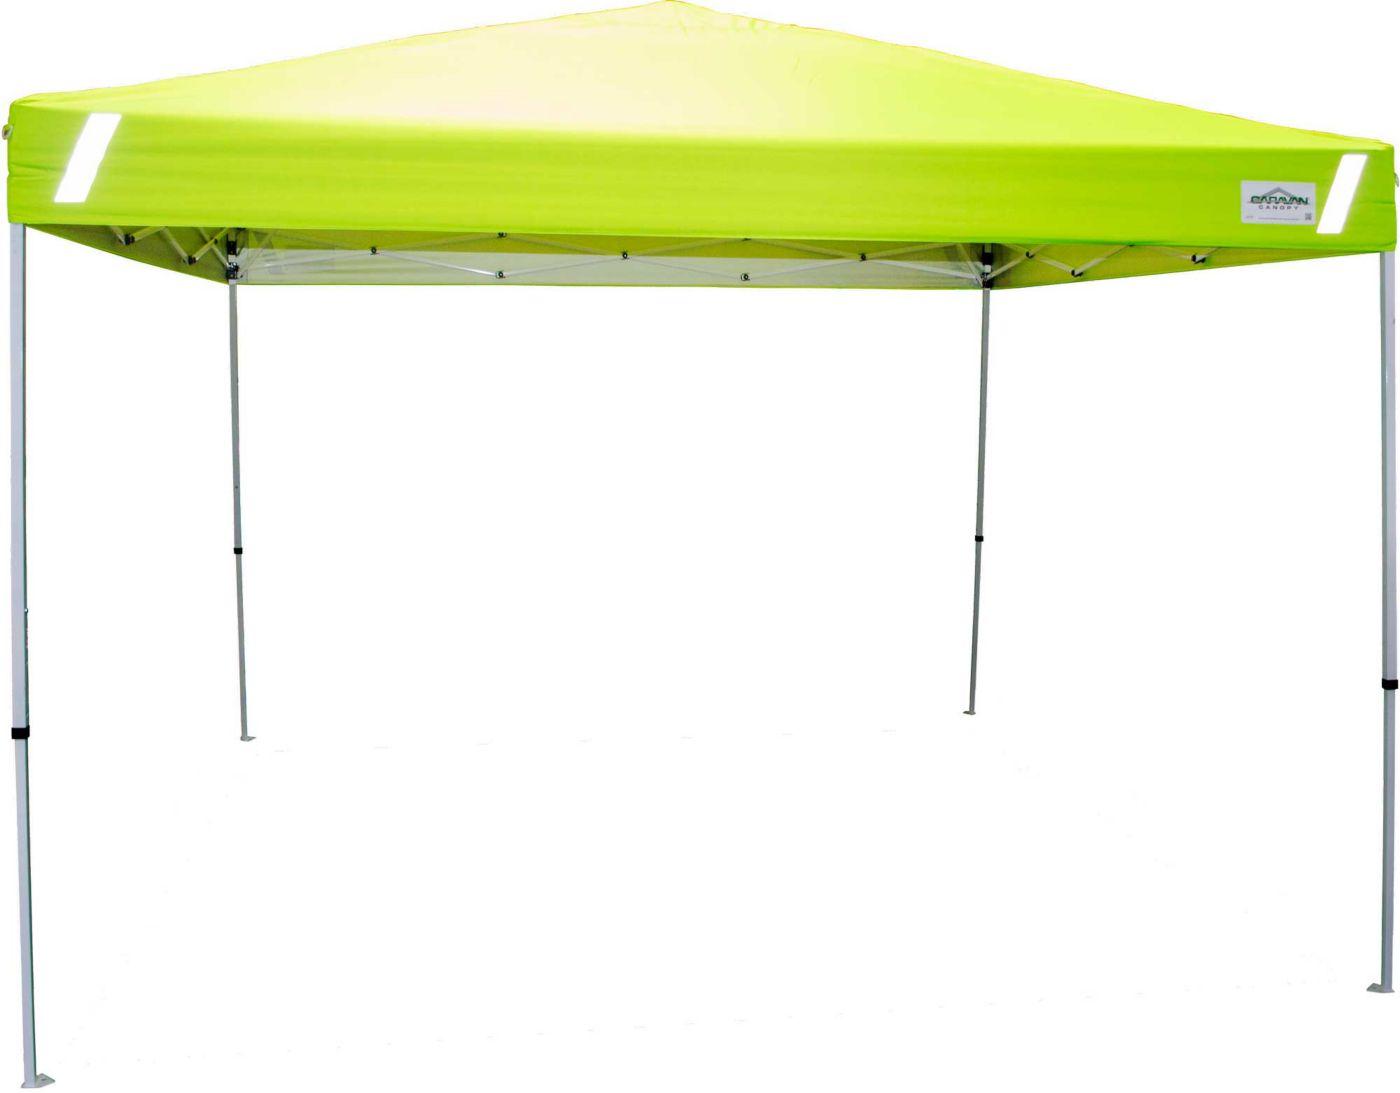 Caravan Canopy V-Series 2 Pro 10'x10' Safety Canopy